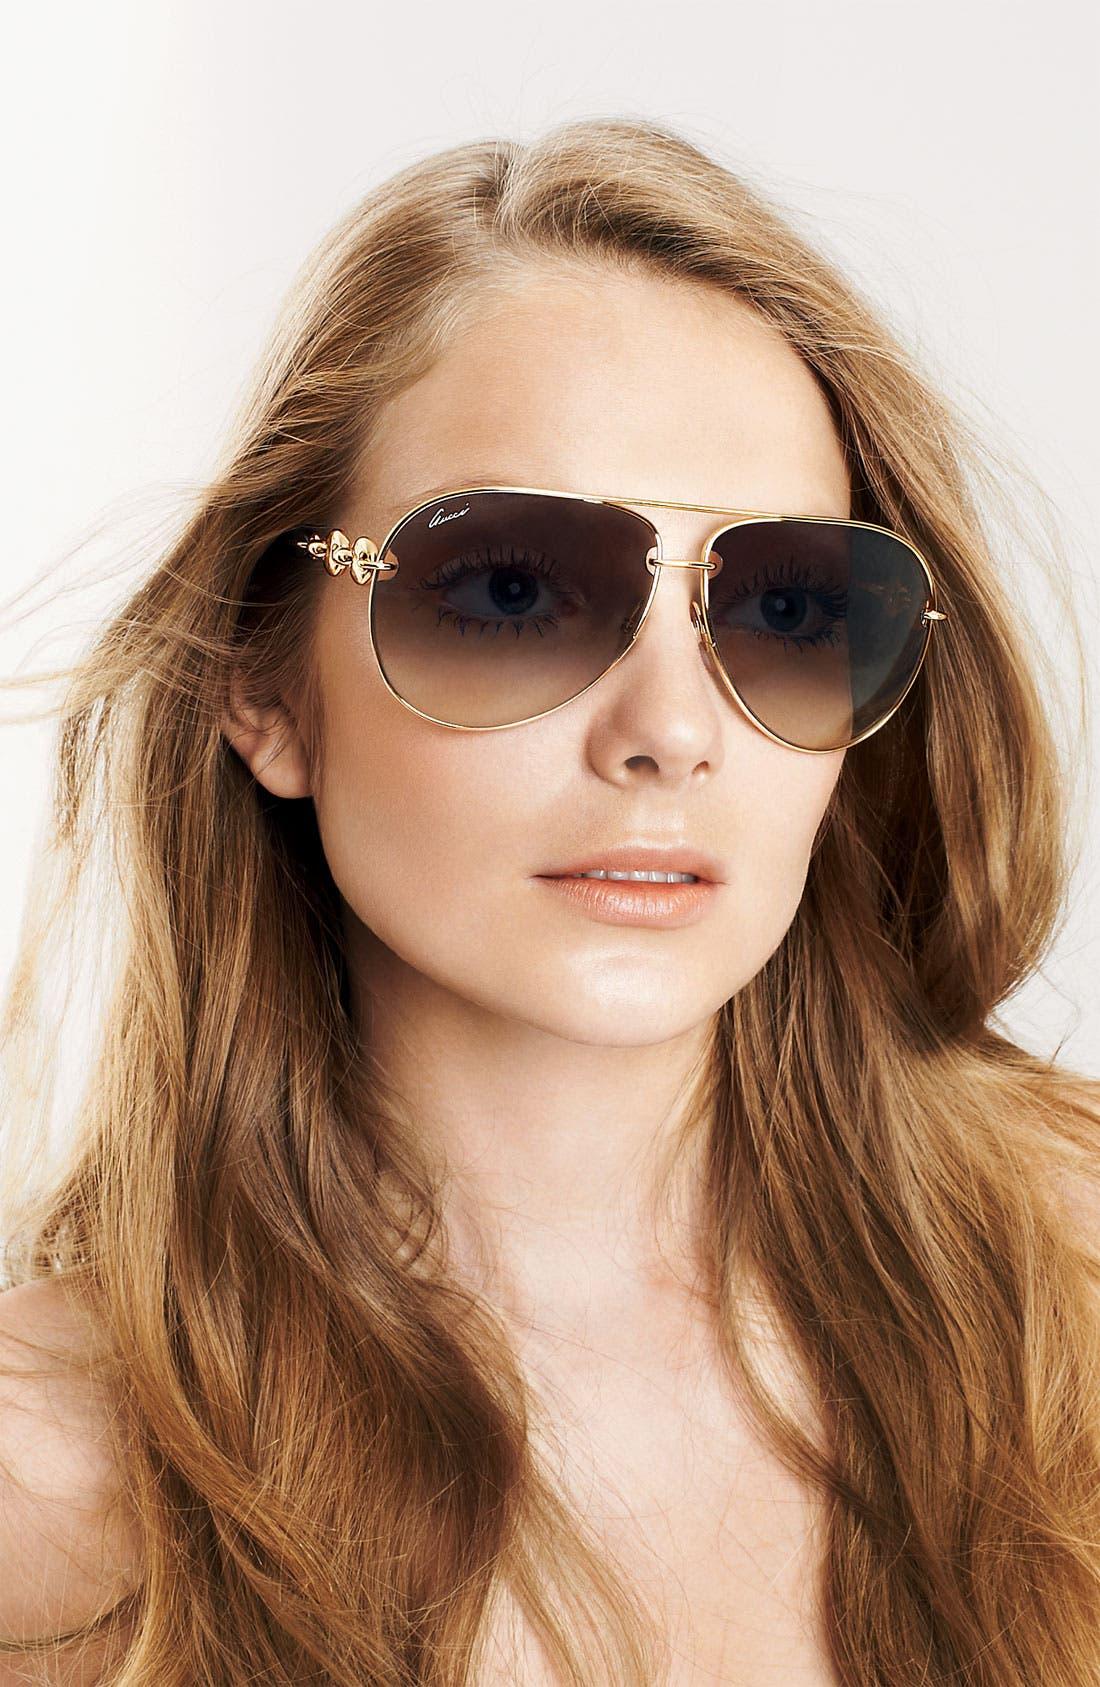 'Marina Chain' 63mm Aviator Sunglasses,                             Alternate thumbnail 2, color,                             001